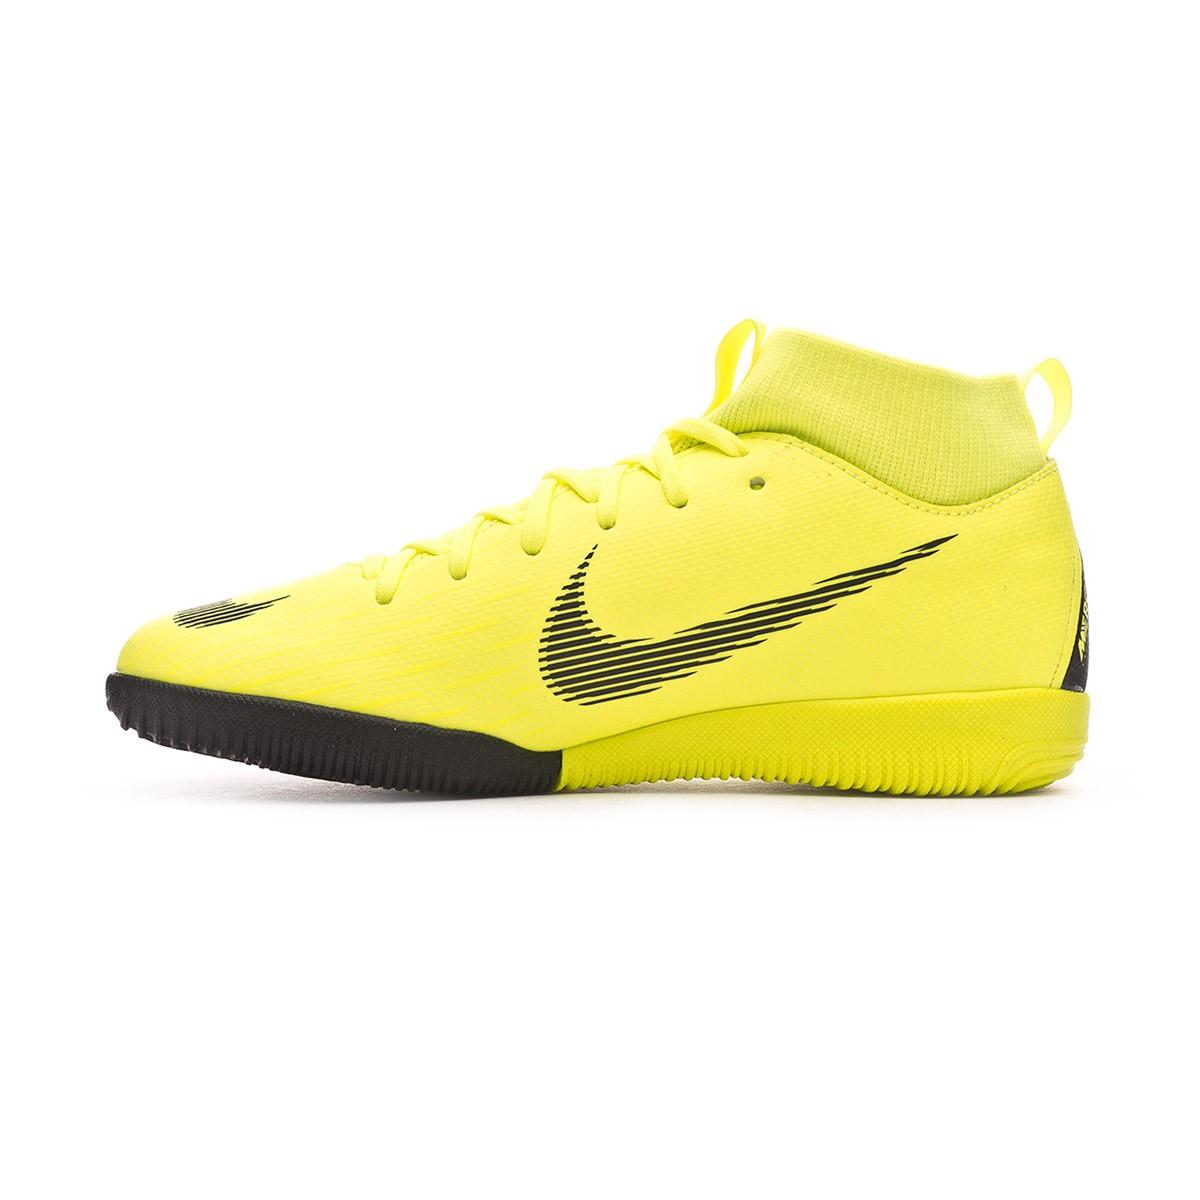 b3c63451f Futsal Boot Nike Kids Mercurial SuperflyX VI Academy IC Volt-Black -  Football store Fútbol Emotion